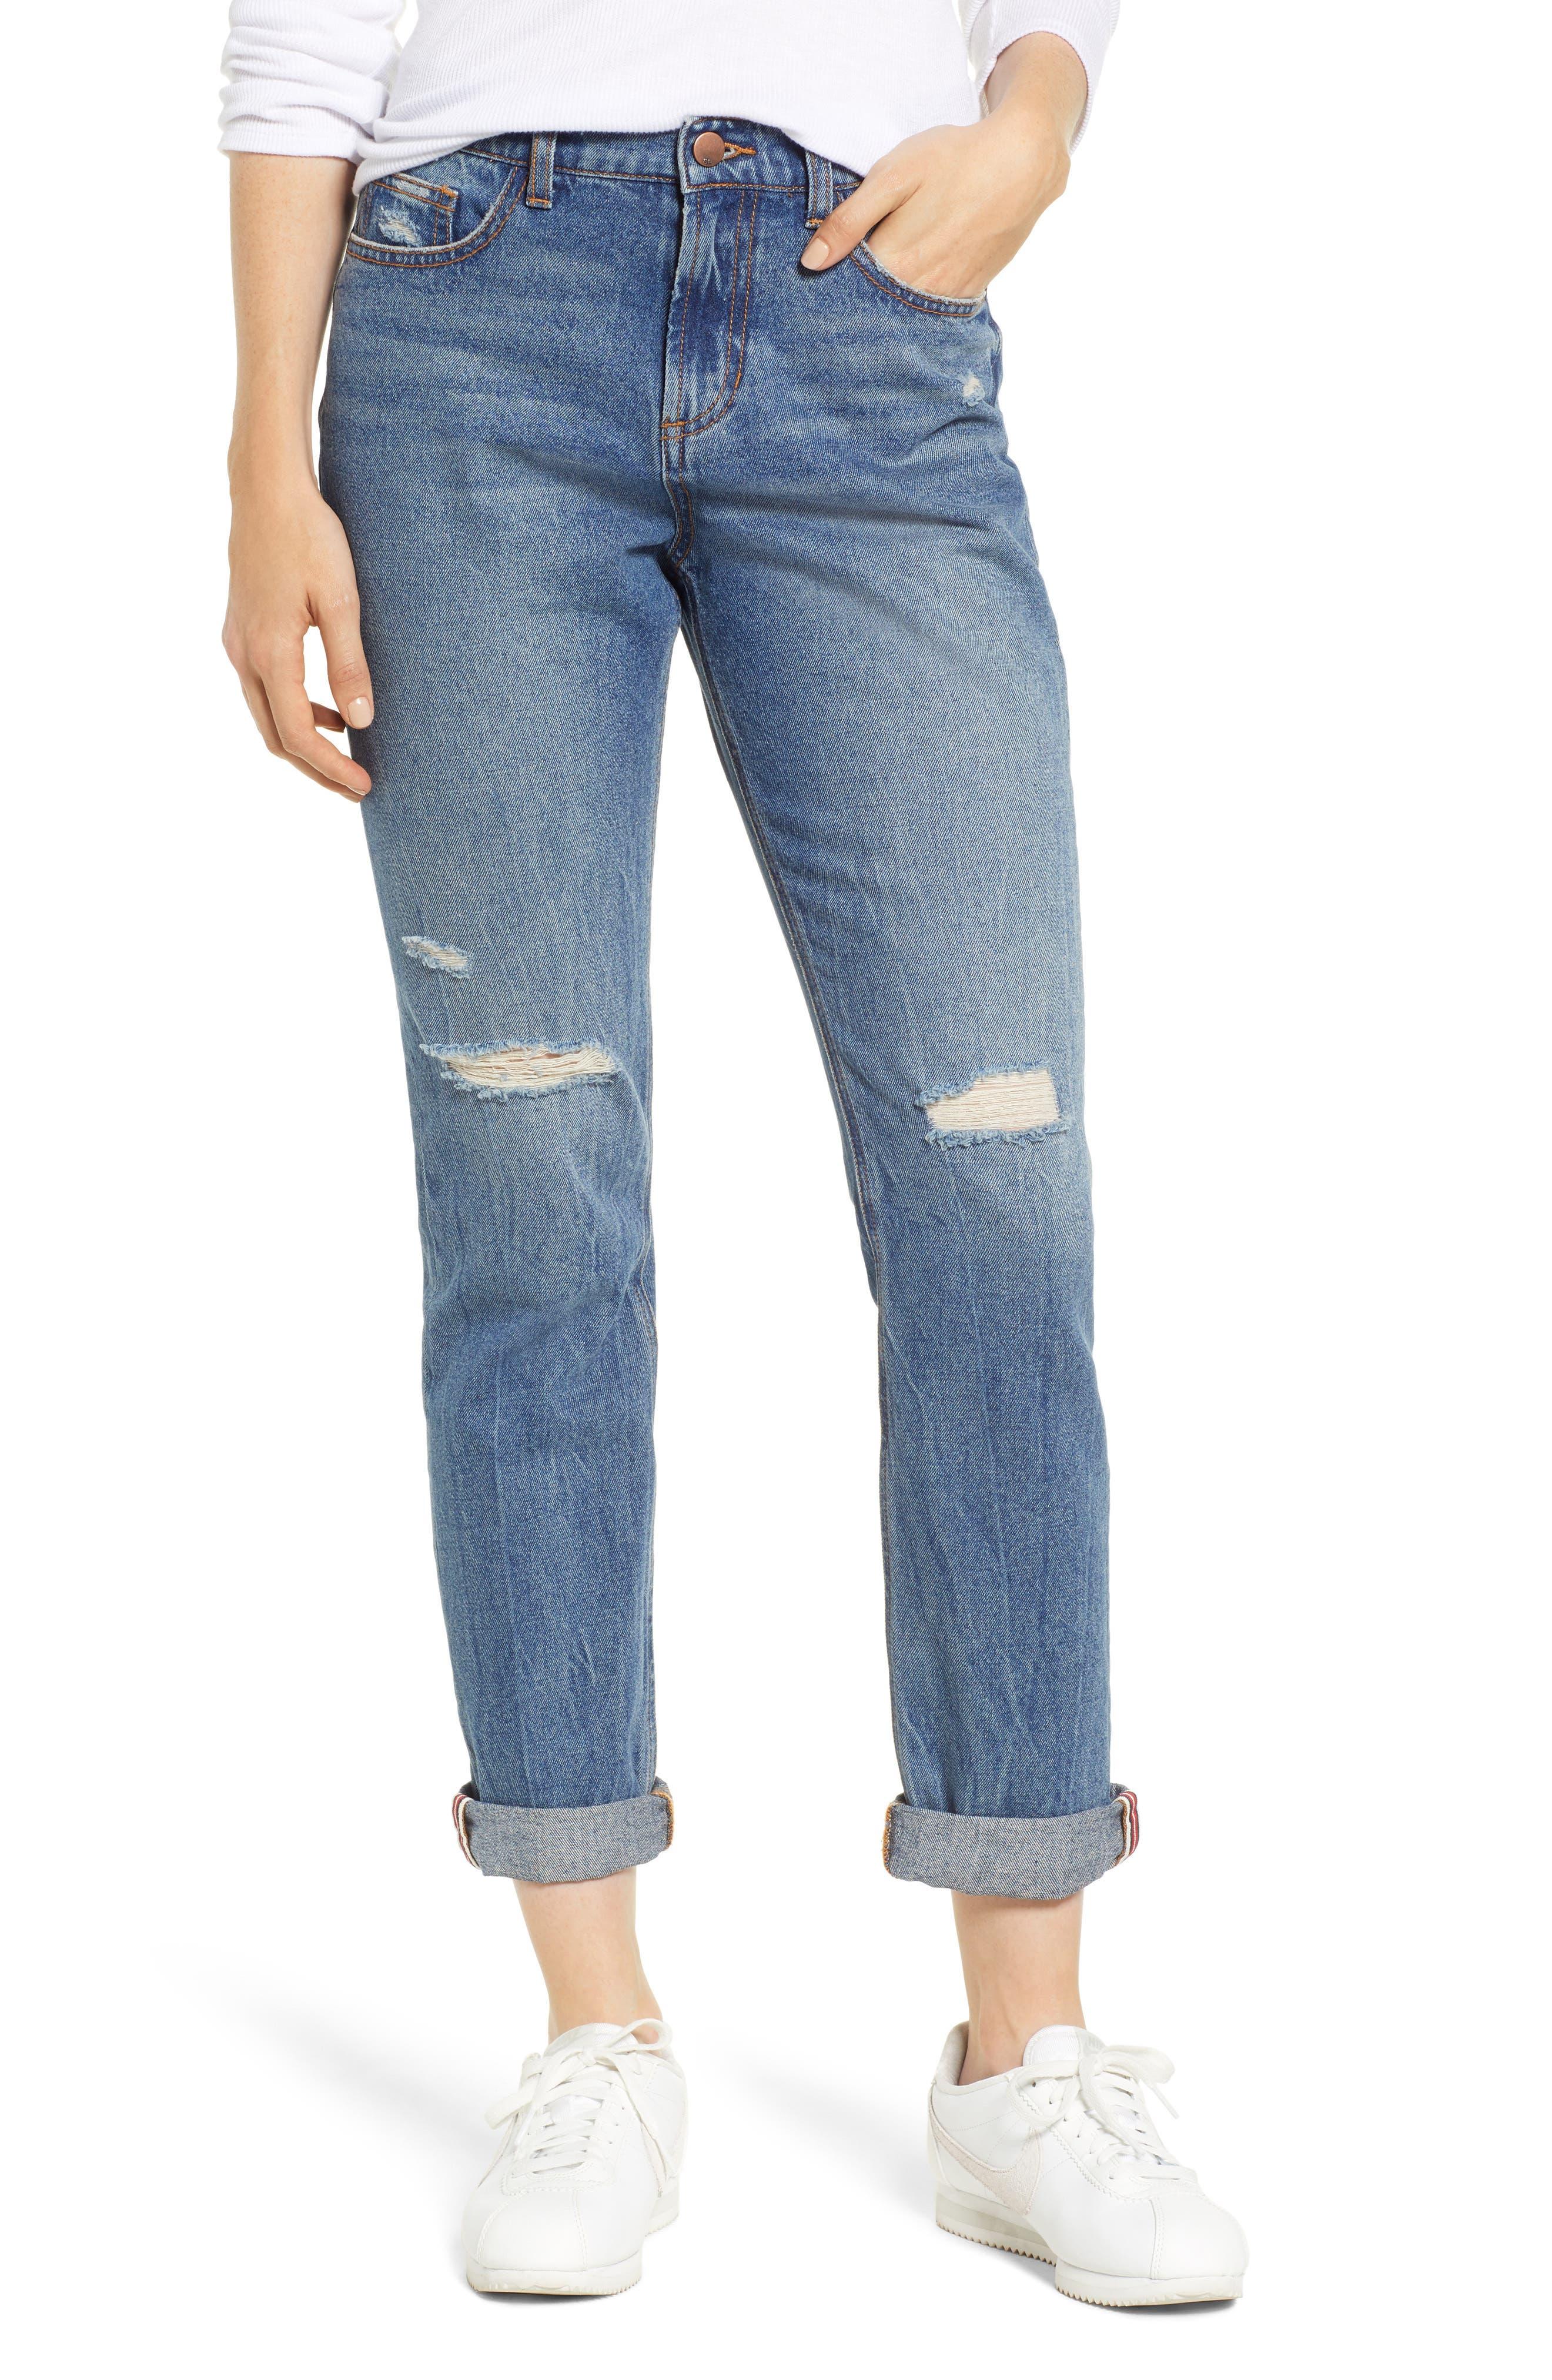 SP BLACK Cuffed Ripped Boyfriend Jeans, Main, color, 420